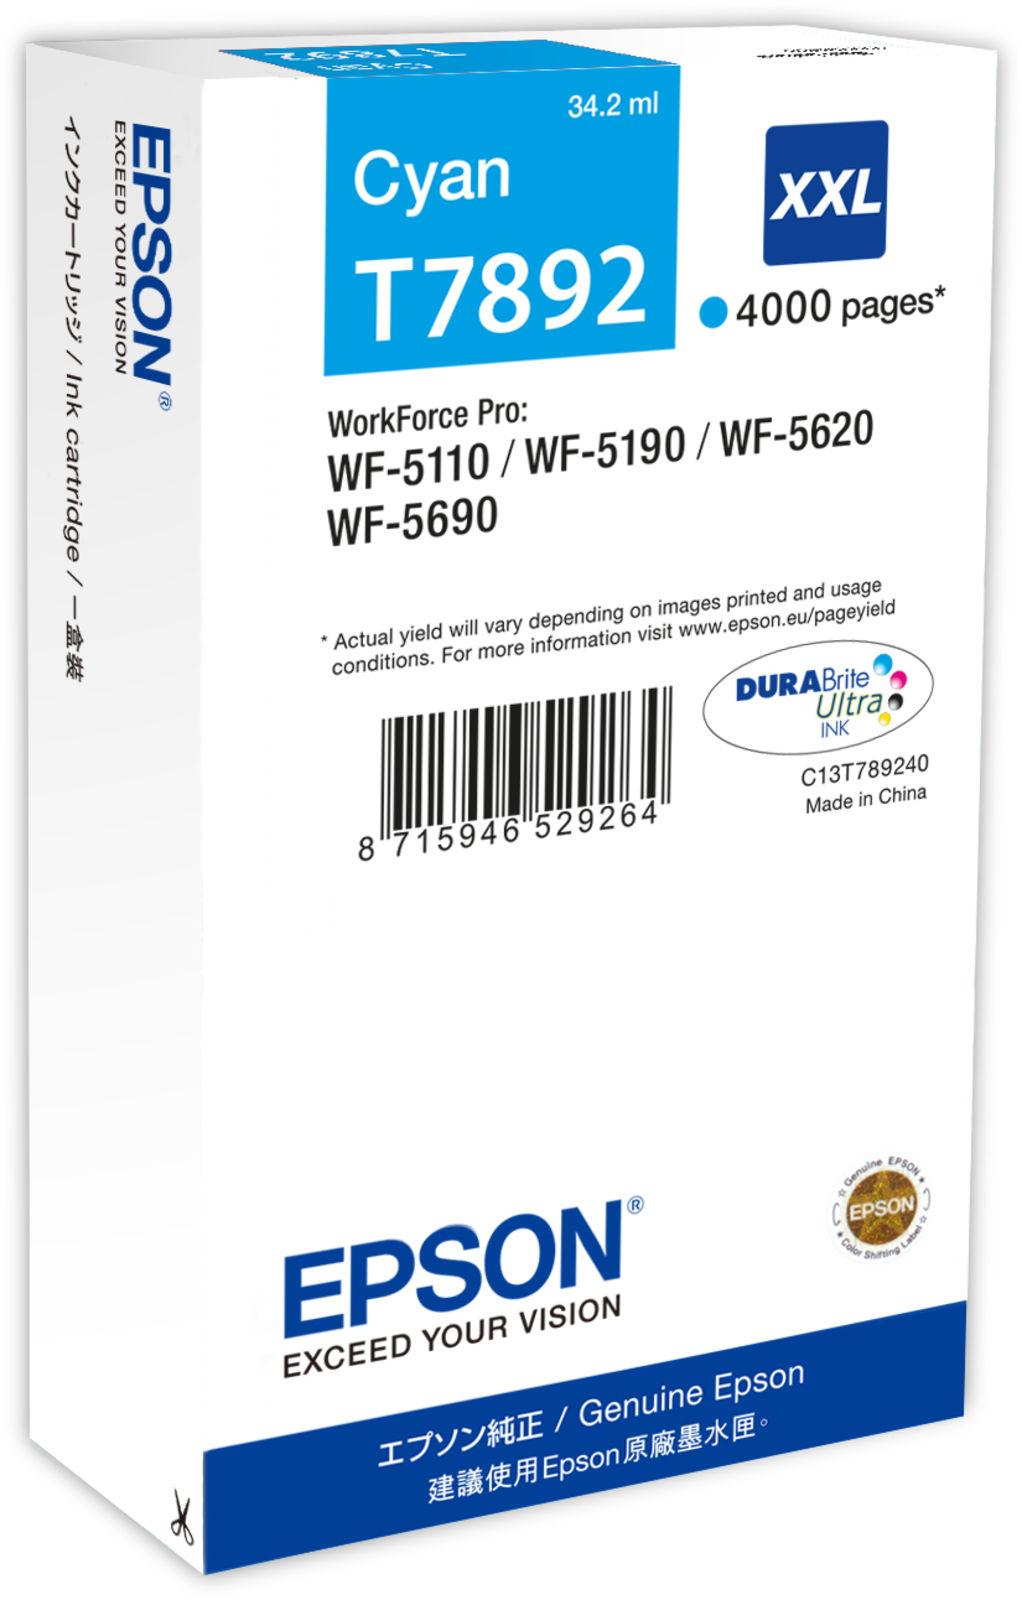 Epson Ink Cartridge XXL Cyan